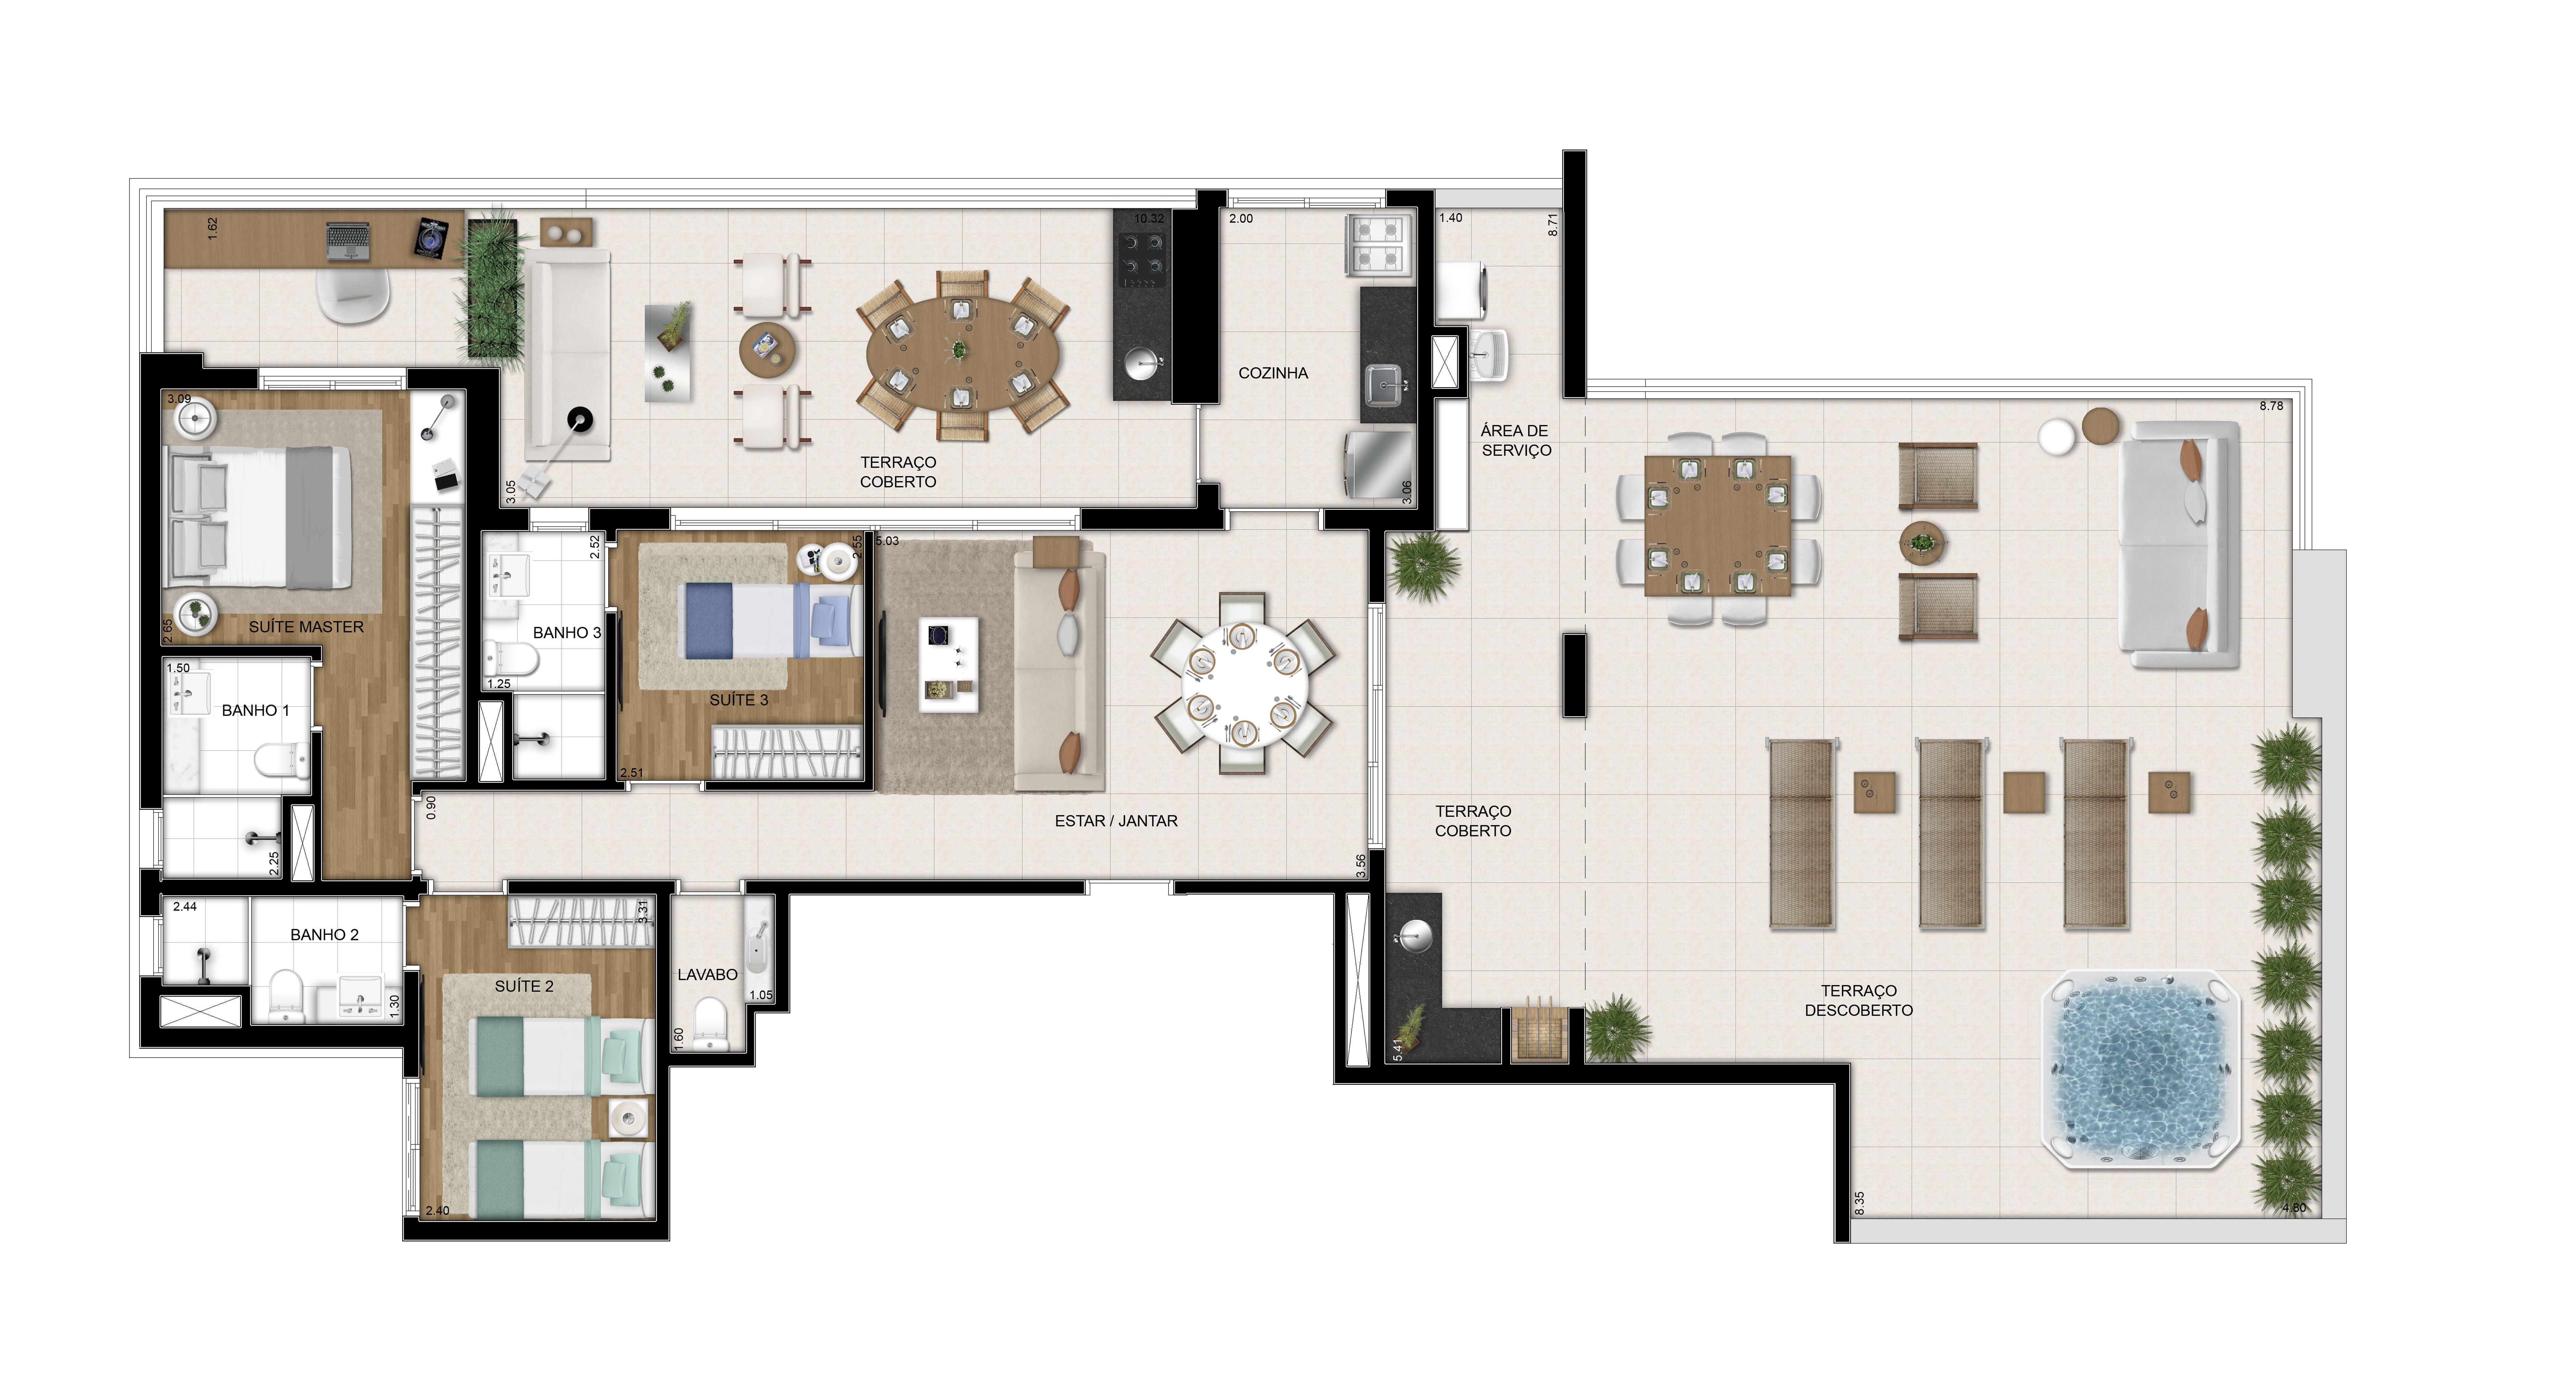 Planta Penthouse - 187,23m²